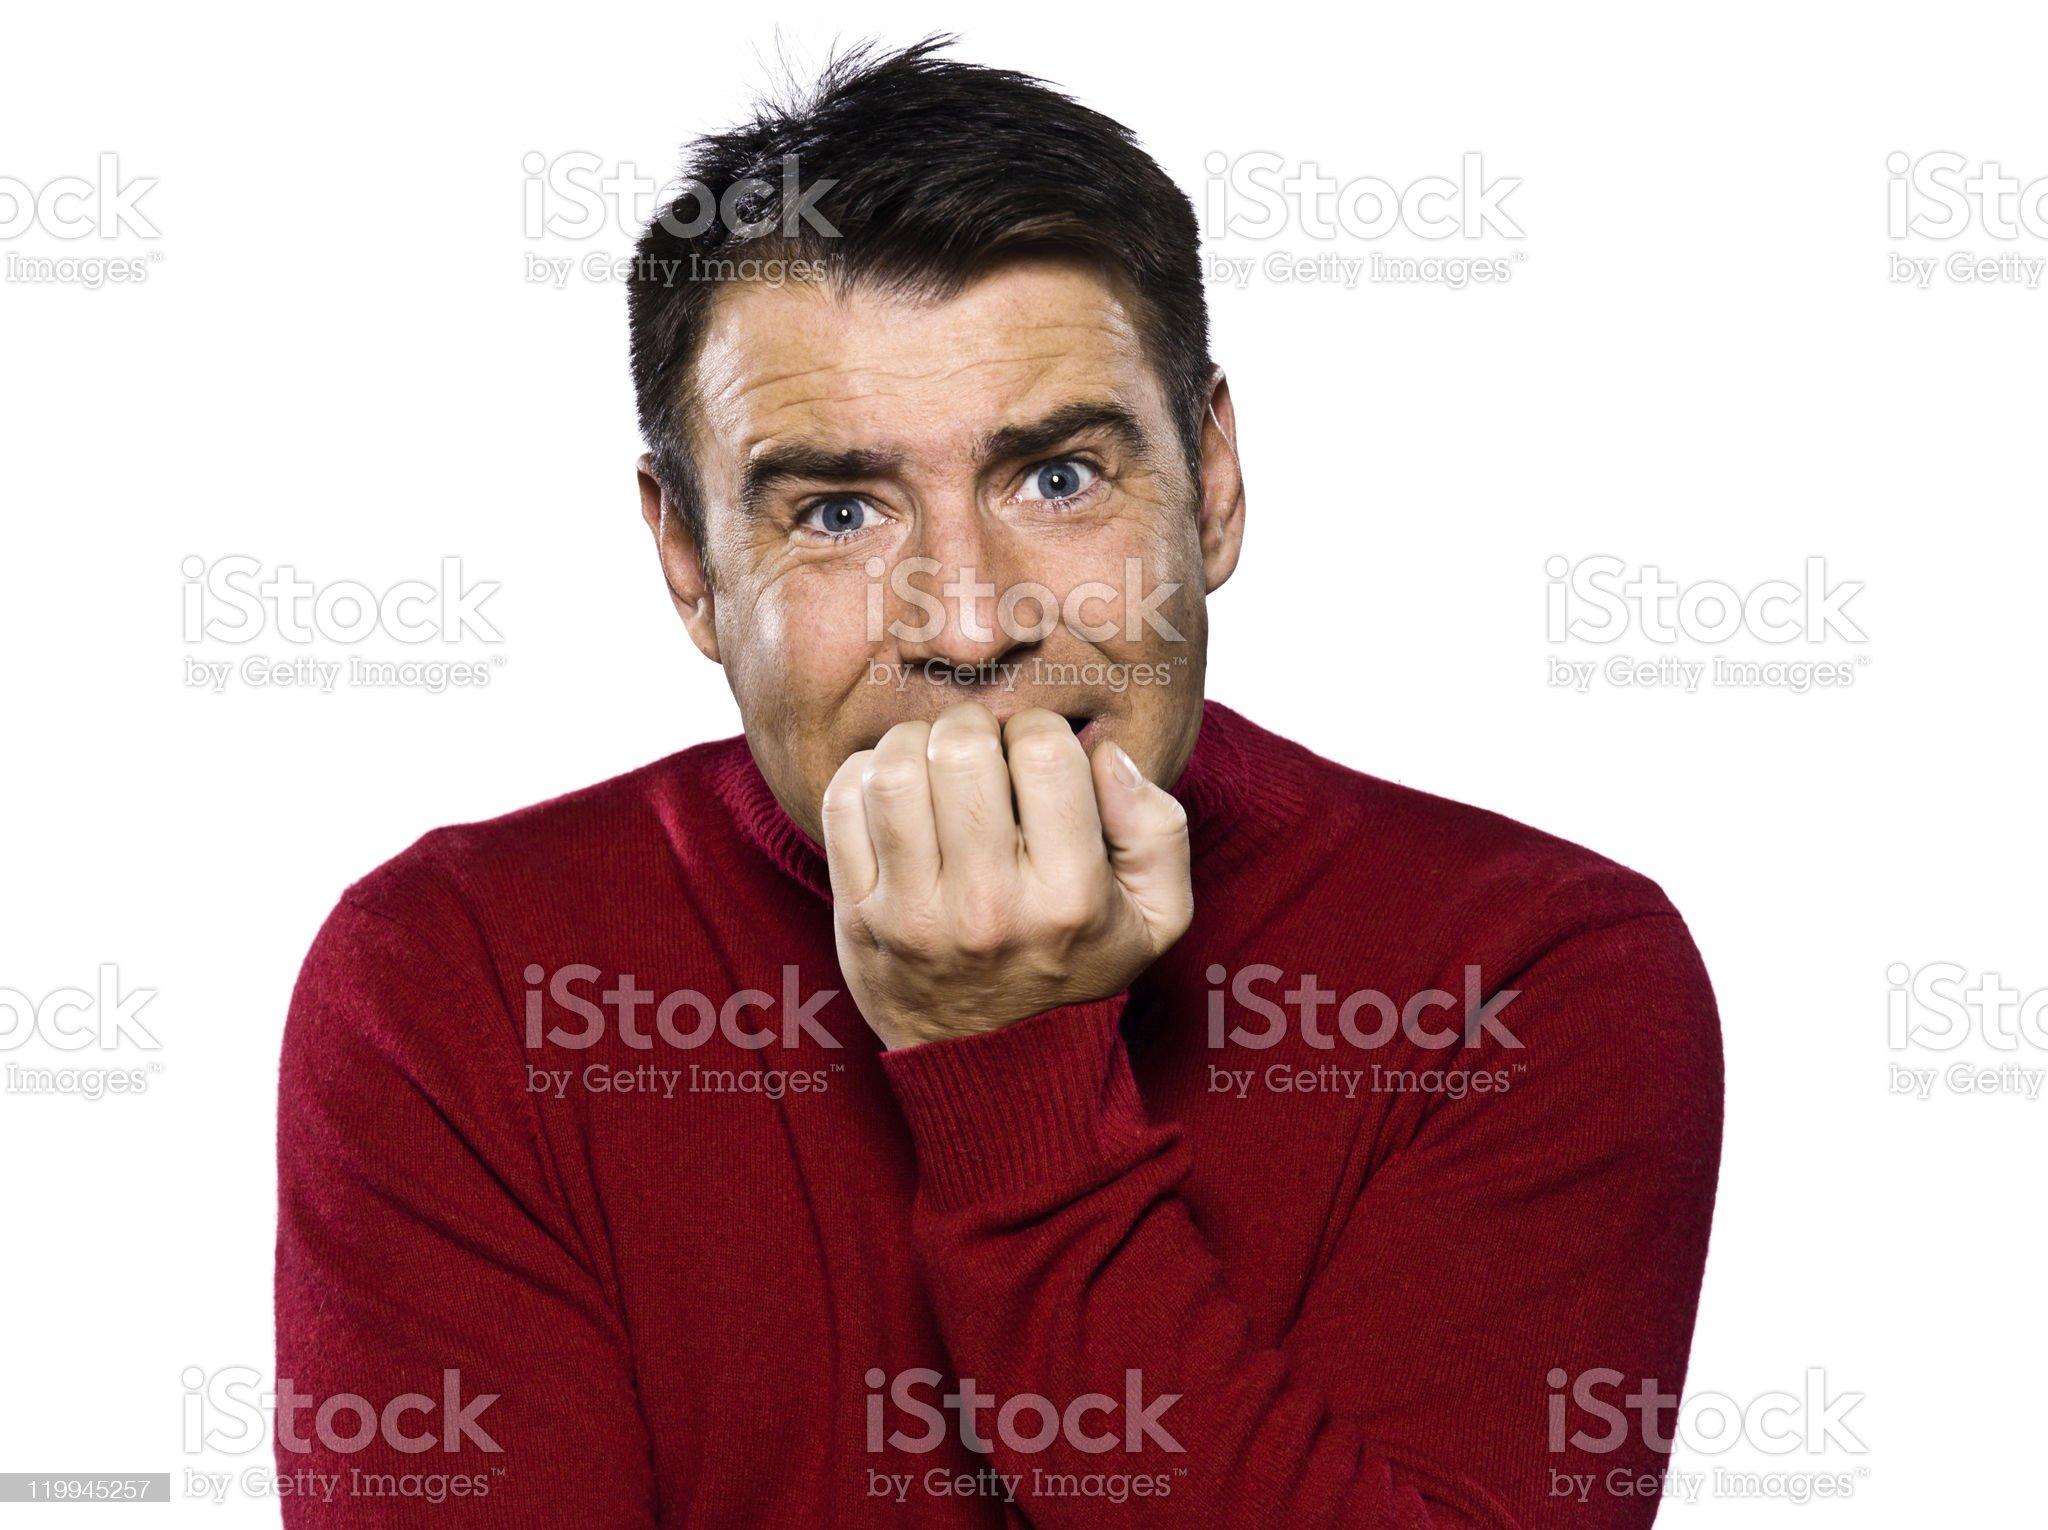 caucasian man portrait afraid fear royalty-free stock photo